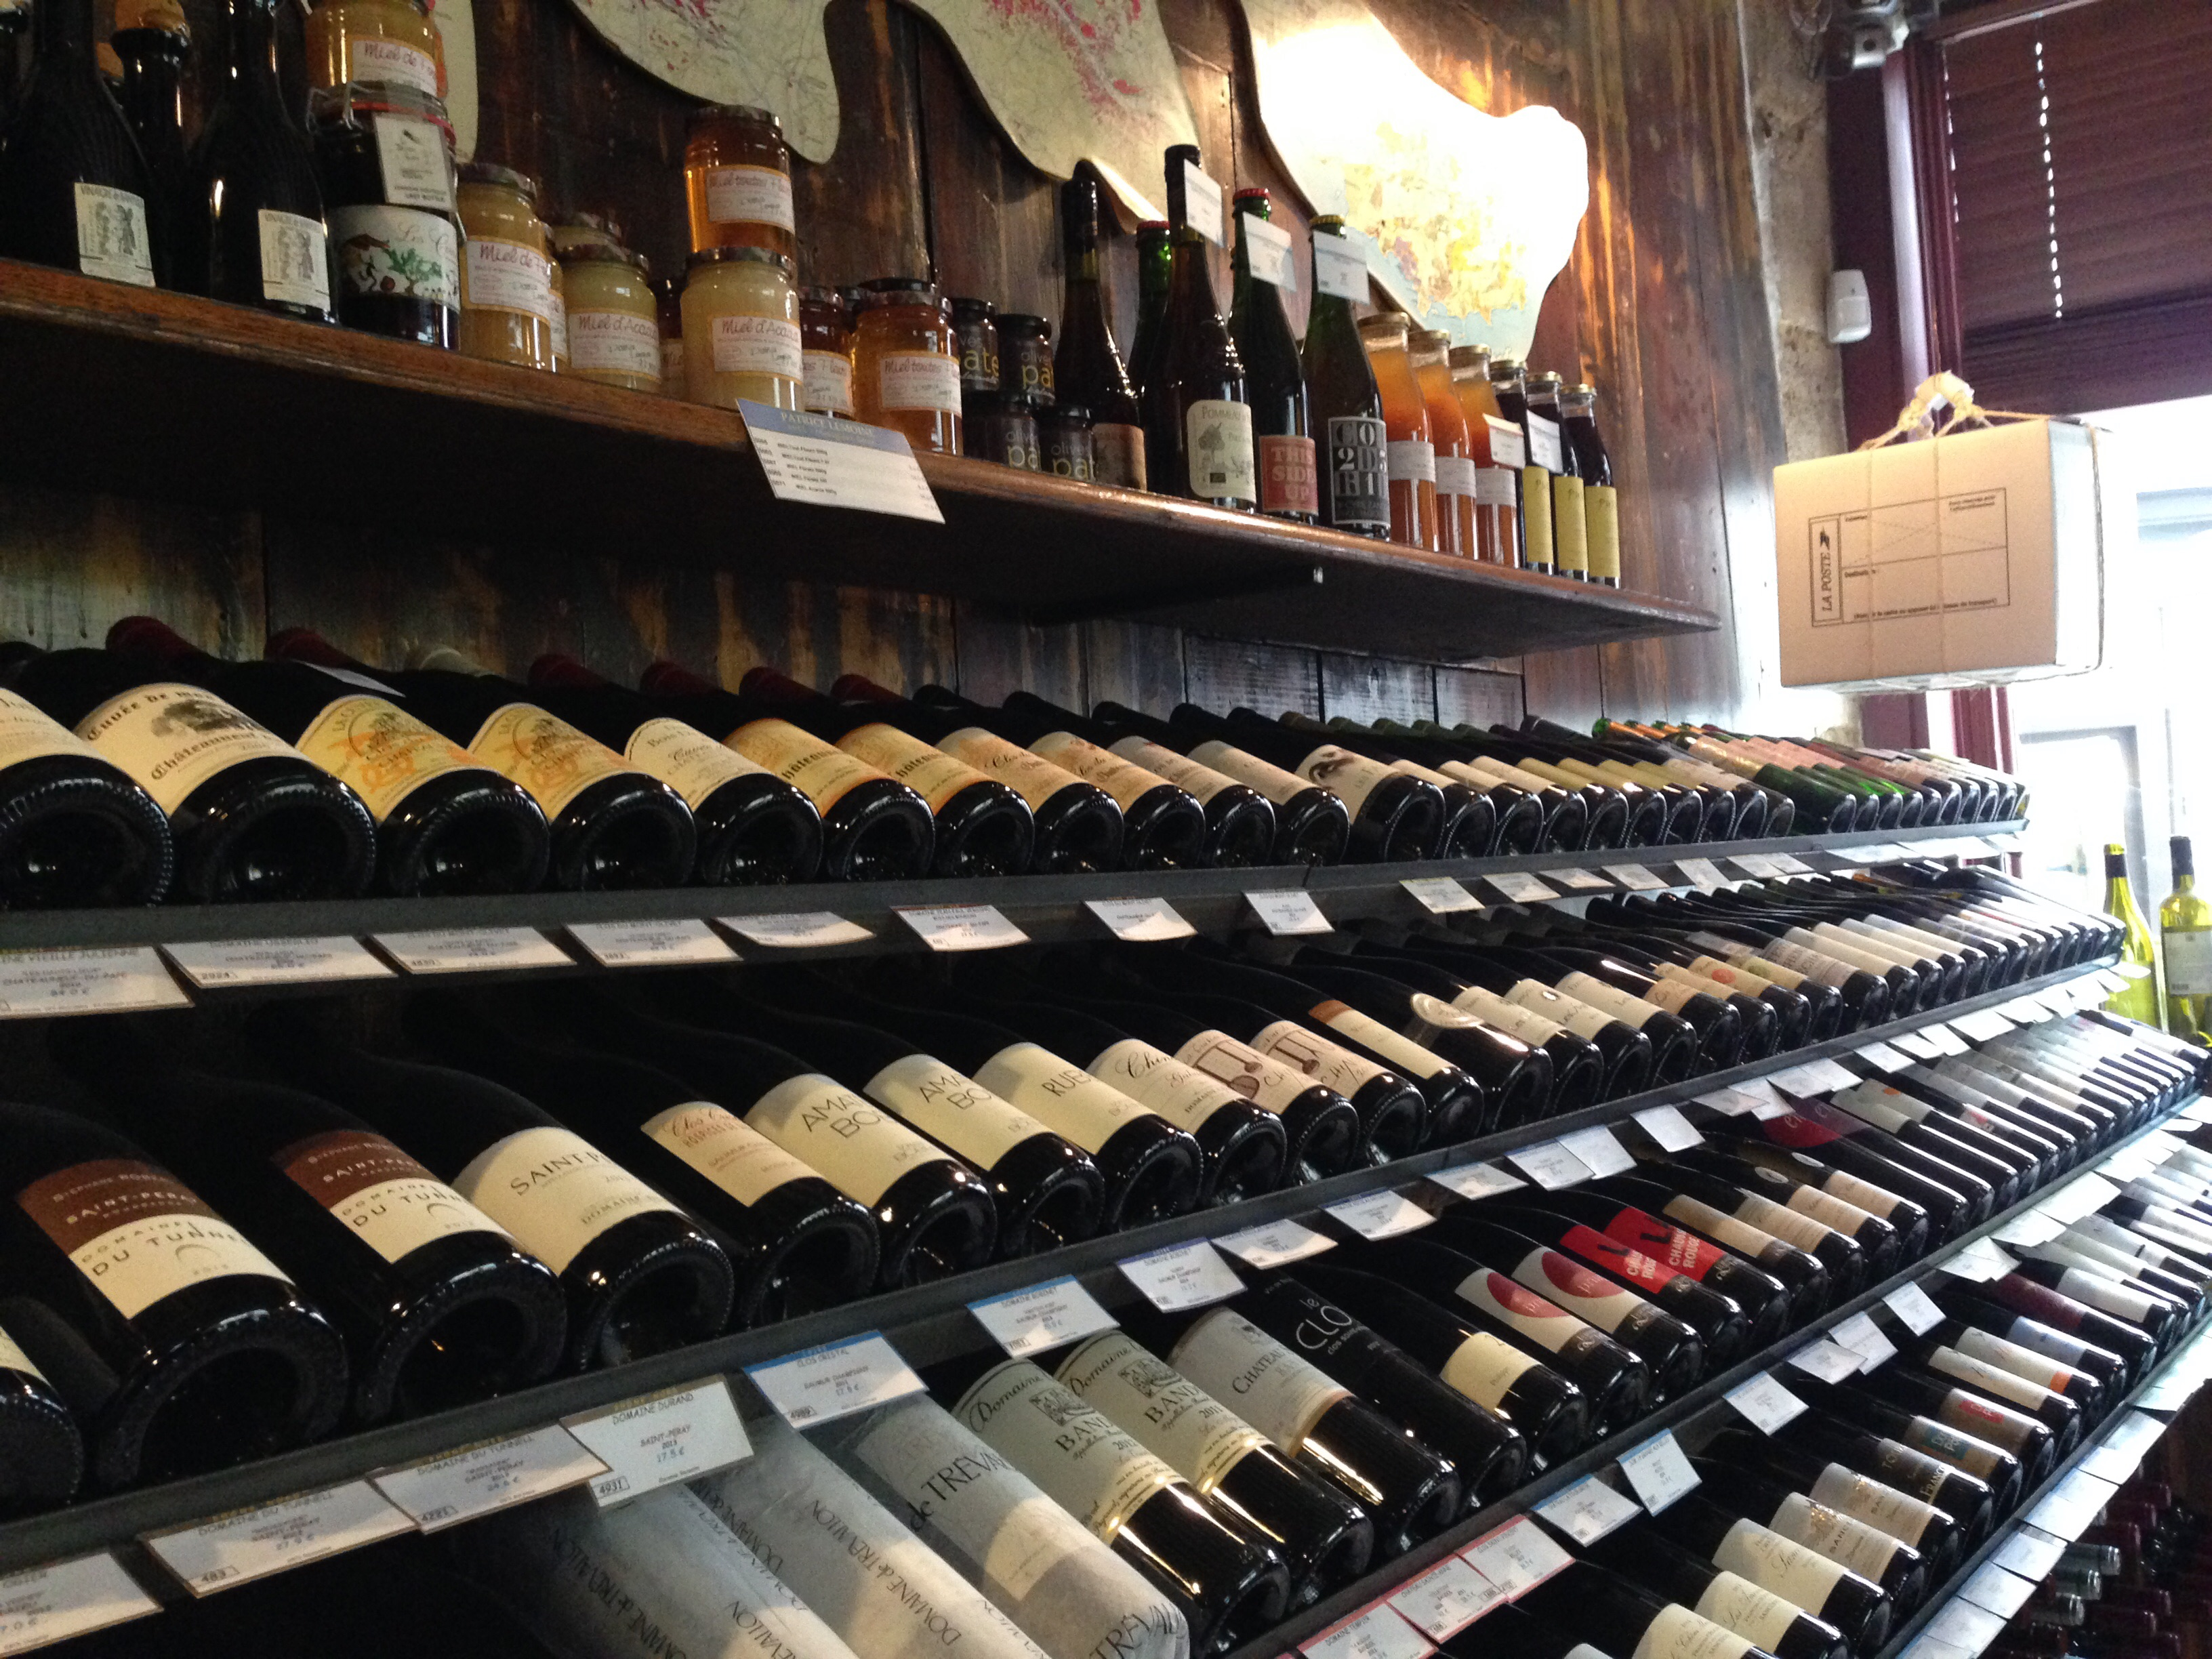 Wine bottles in Paris